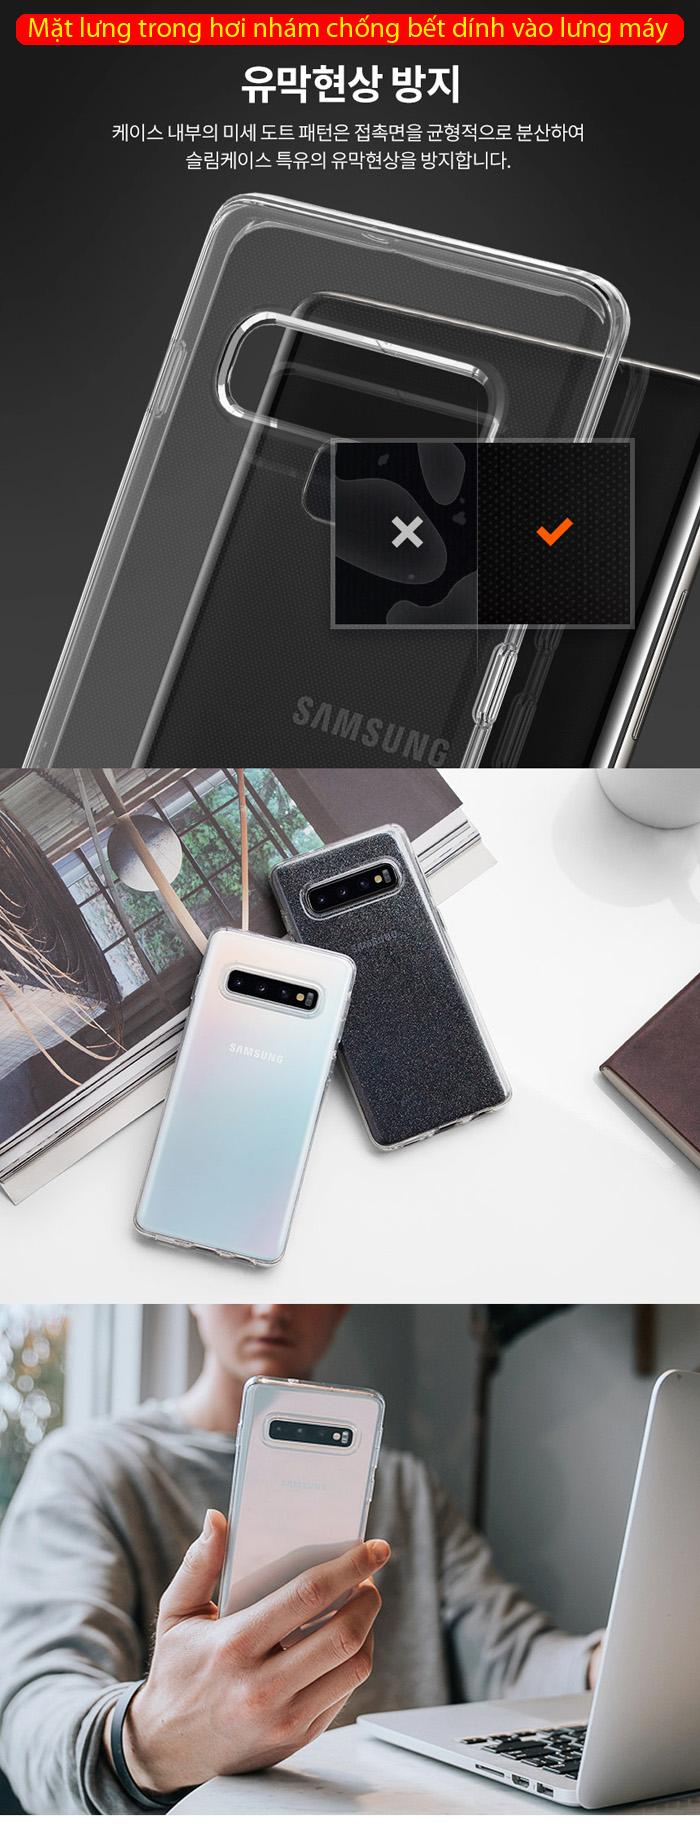 Ốp lưng Galaxy S10 Plus Spigen Liquid Crystal trong suốt ( Hàng USA ) 2